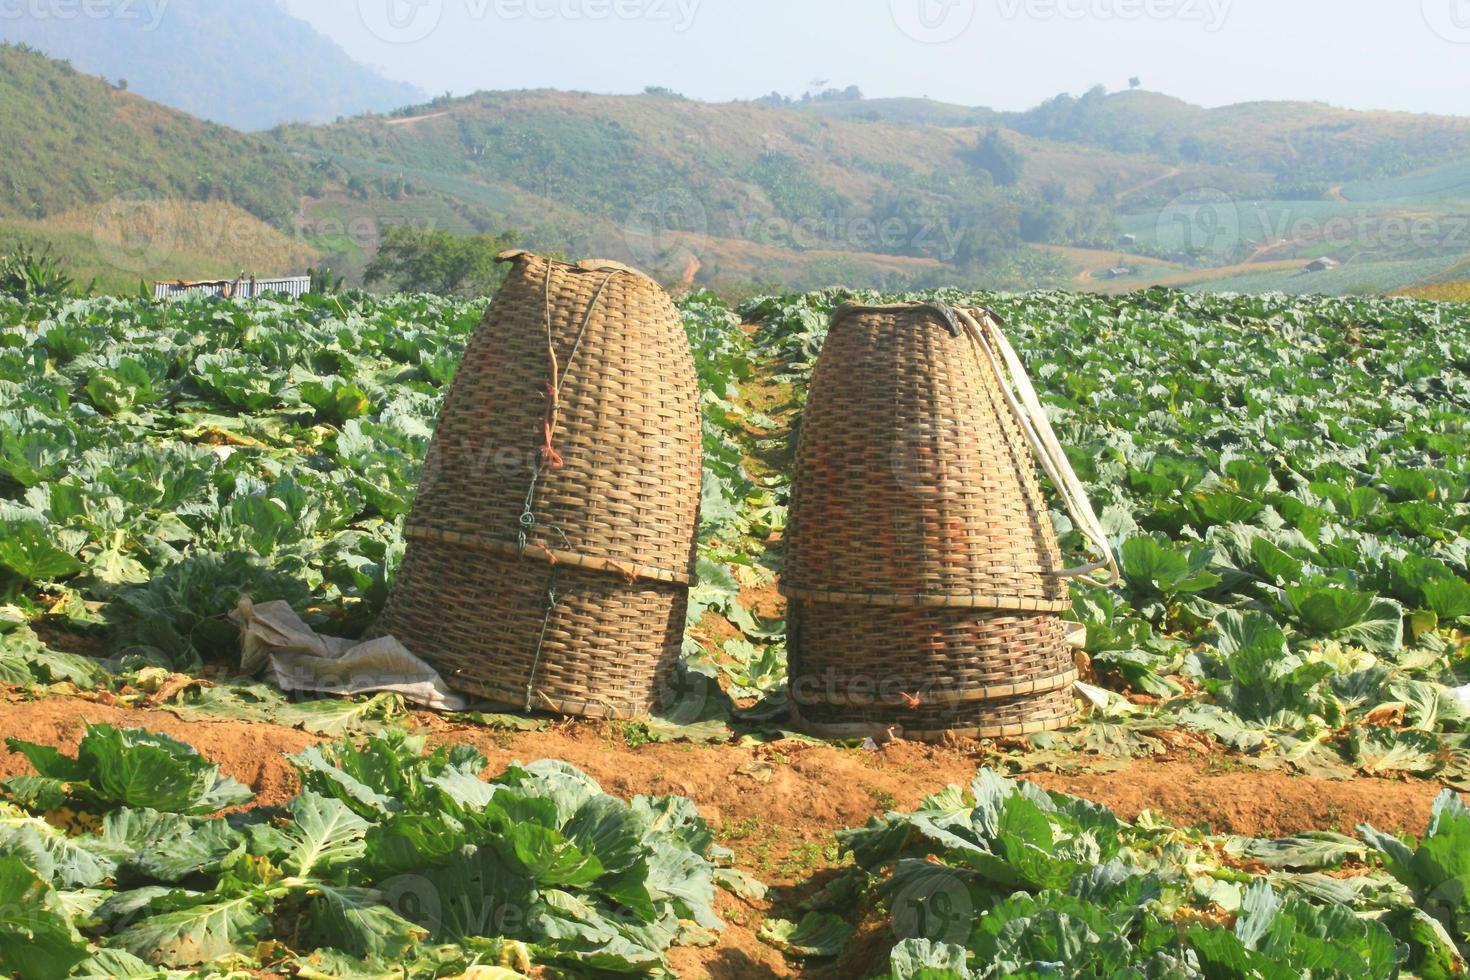 baskets in Cabbage fields photo